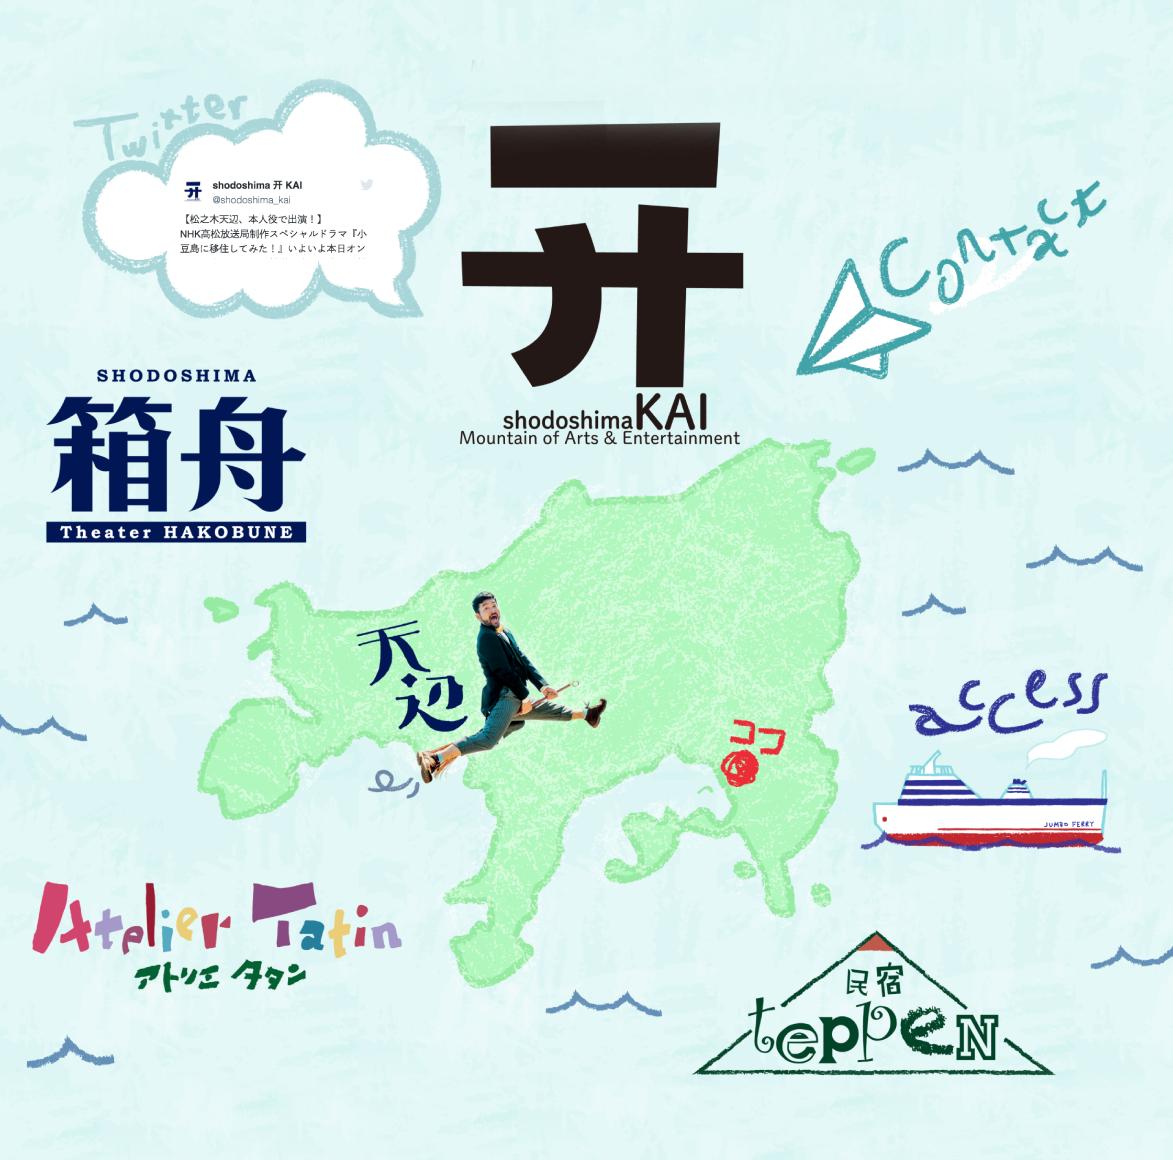 shodoshima 开 KAI HP